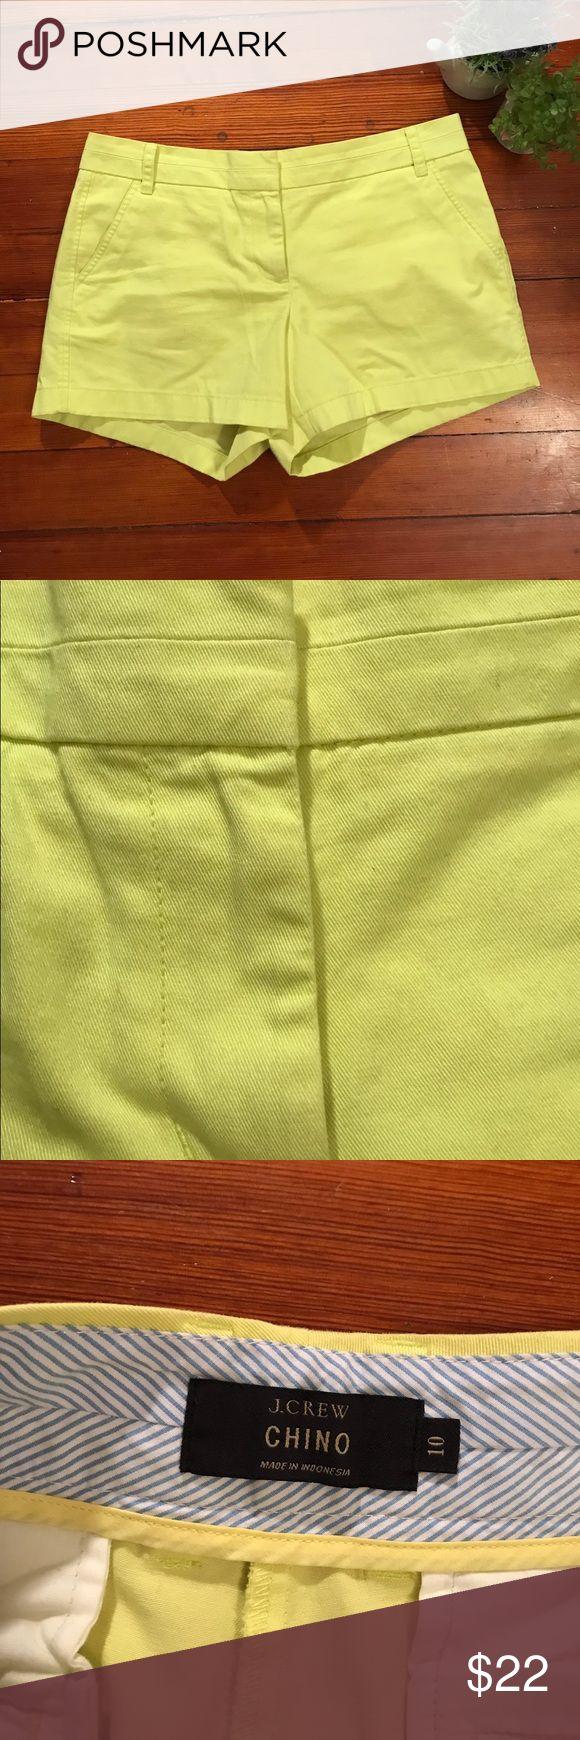 J. Crew shorts J. Crew shorts. Lime green shorts chino fit. Make me an offer ☺️!!! J. Crew Shorts